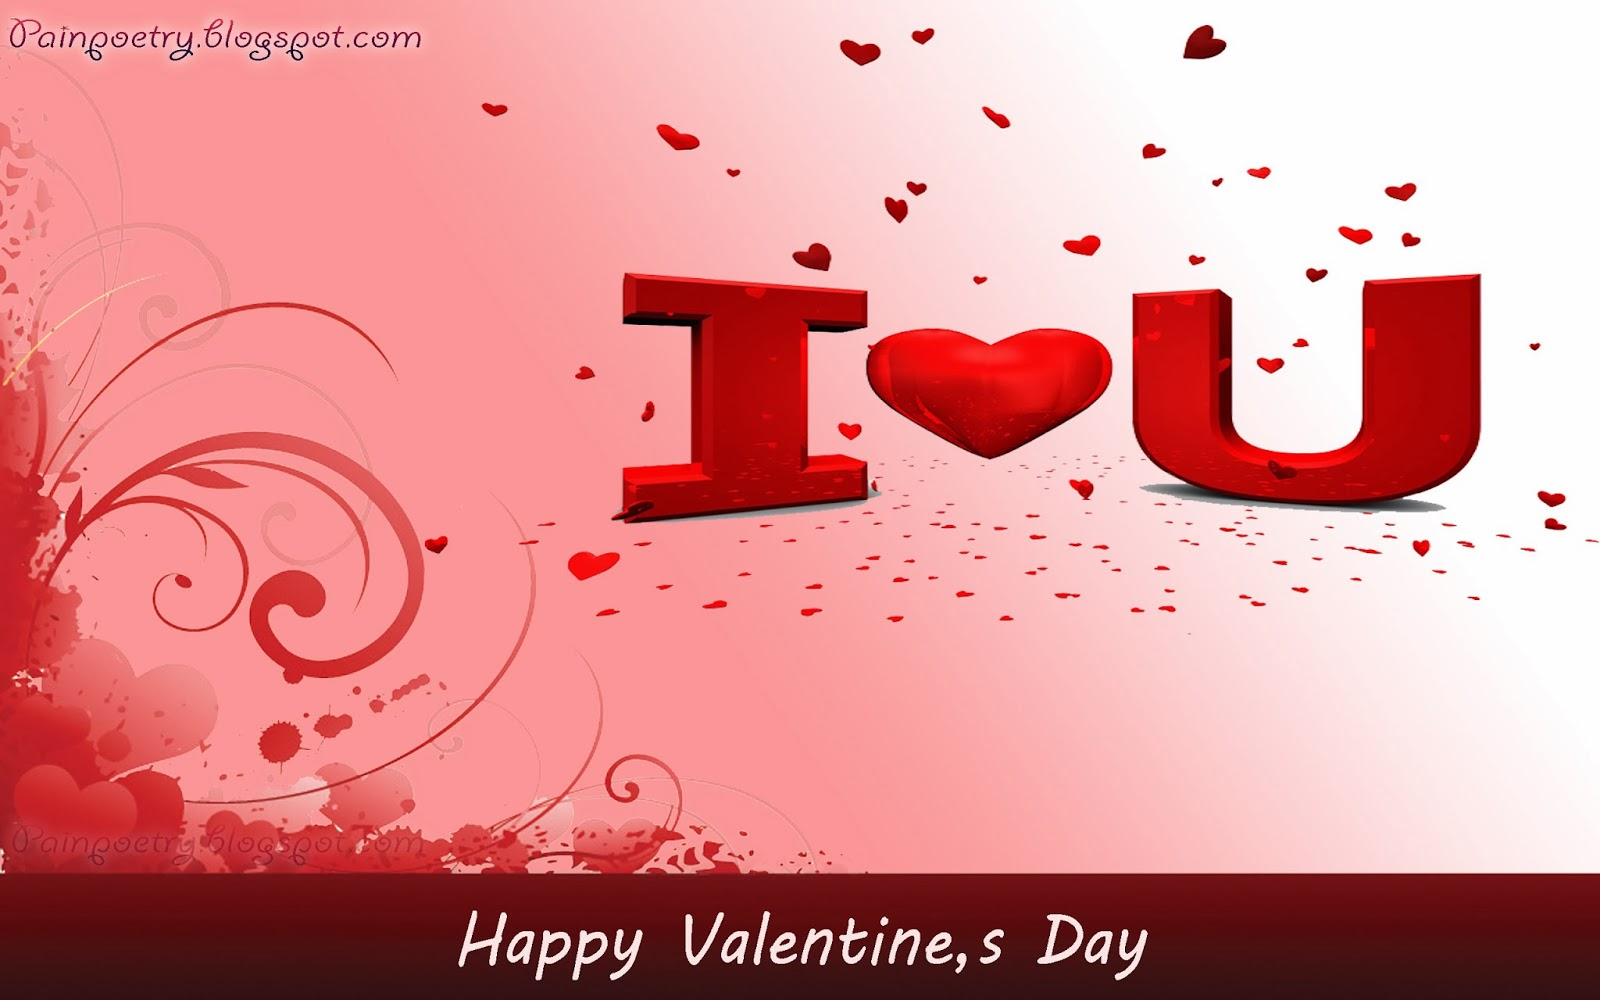 Happy-Valentines-Day-Wishes-Walpaper-HD-Wide